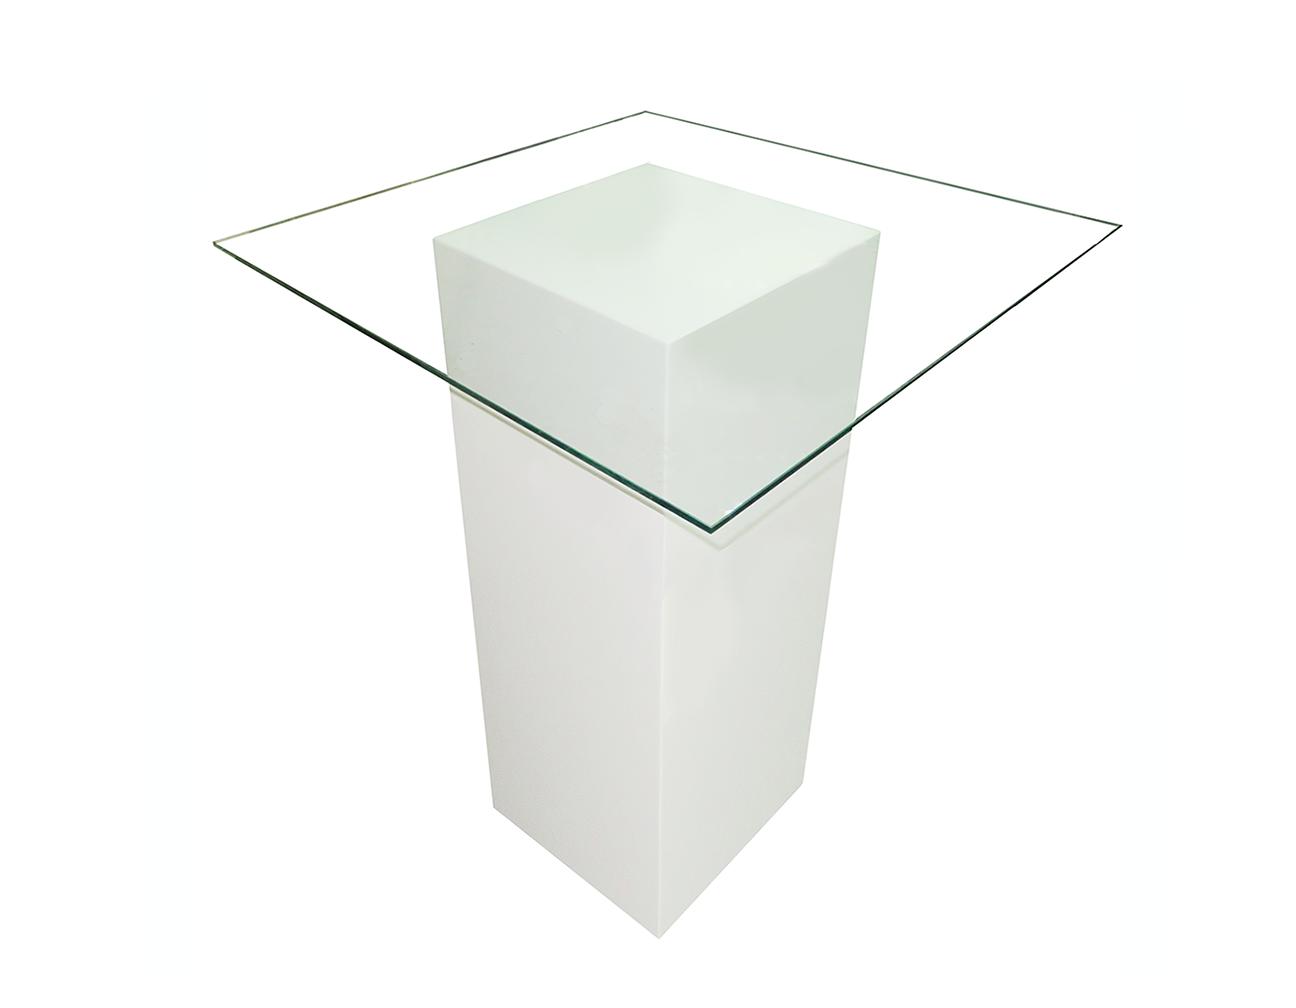 Le Minou Square Glass High Table   High table, Square glass